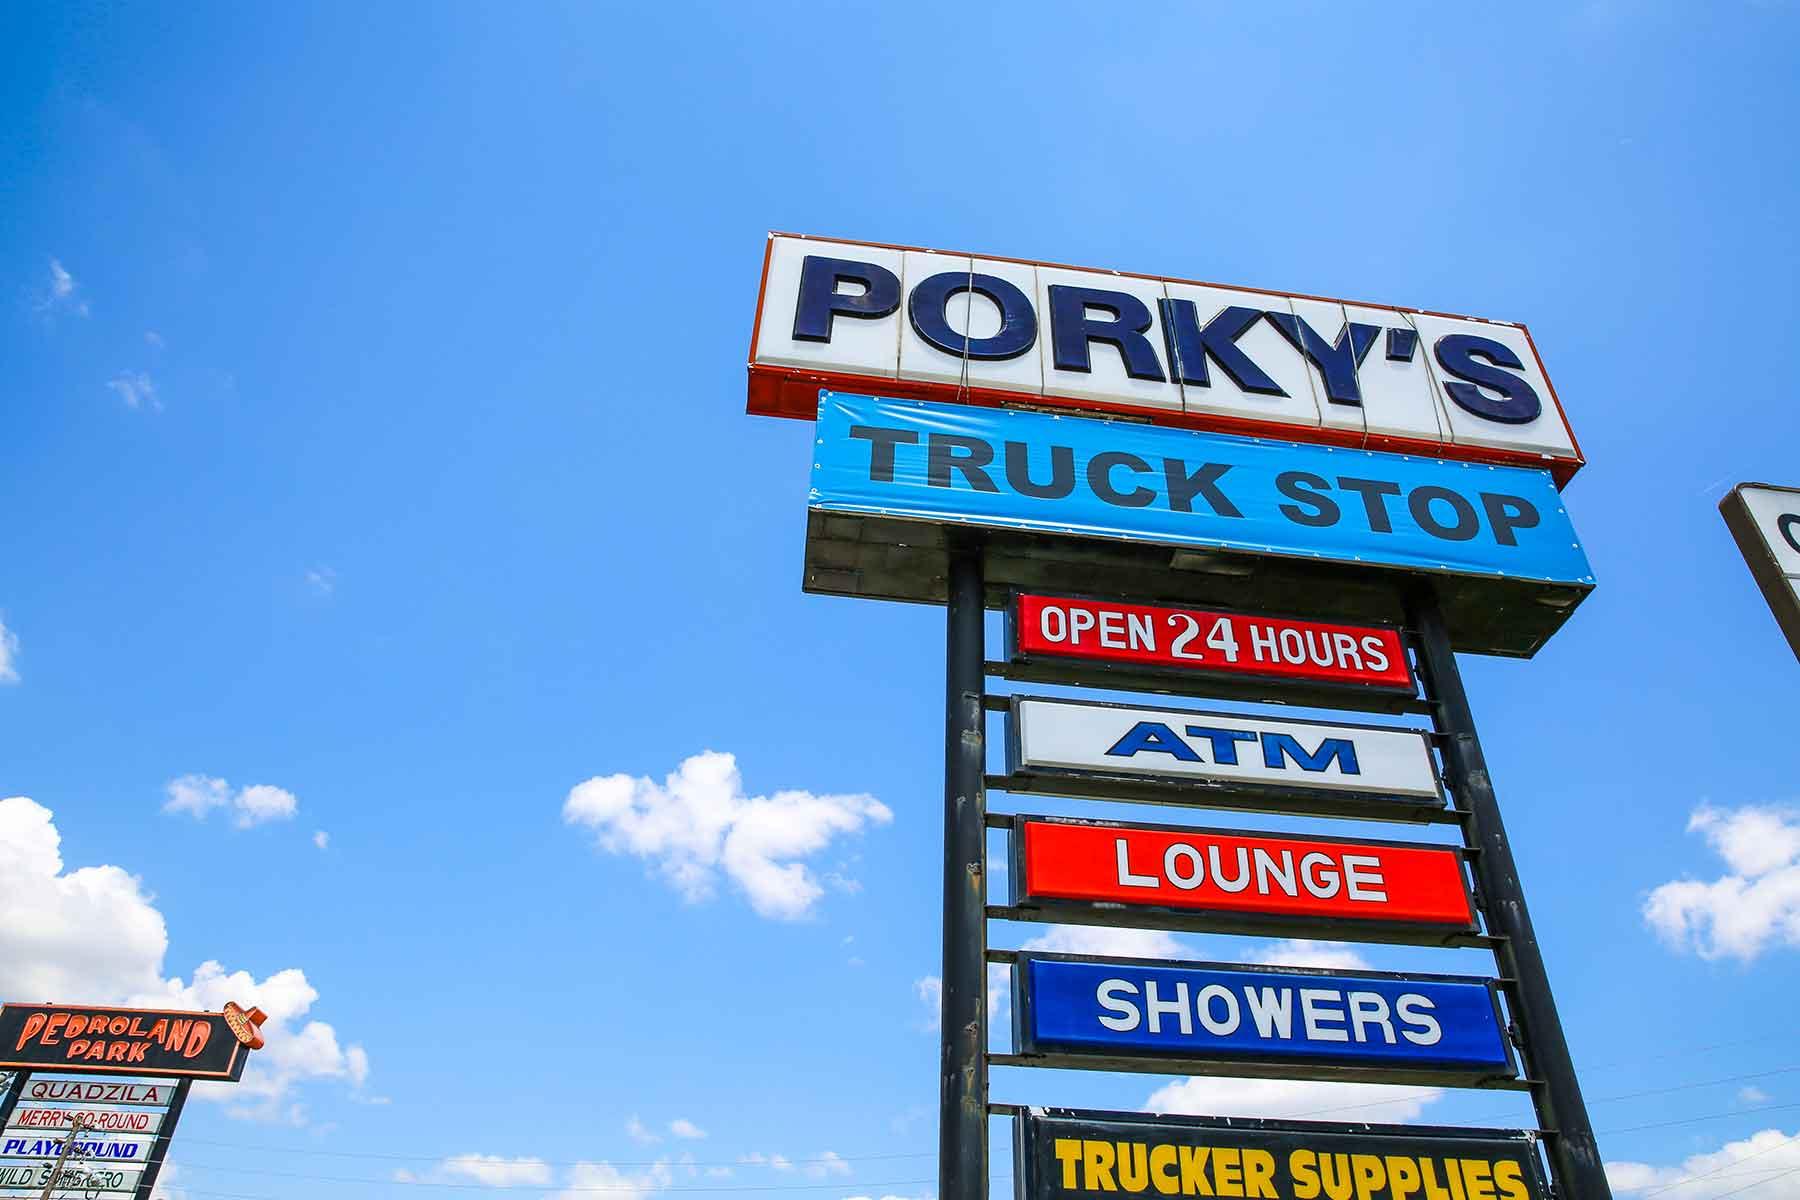 Porkys South of the Border in Hamer, South Carolina